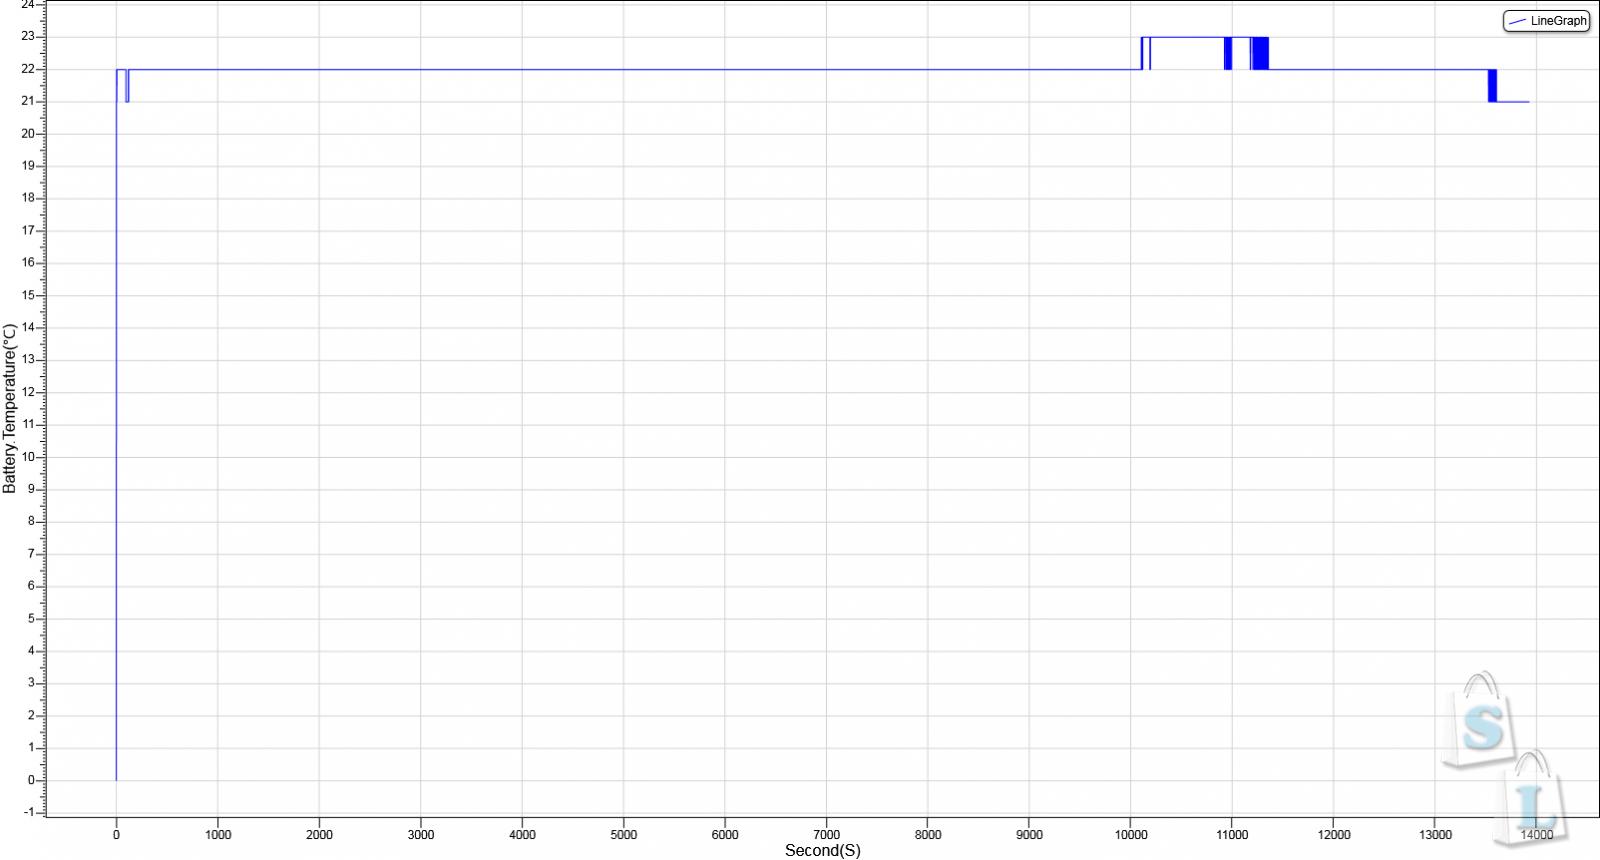 GearBest: Обзор и тестирование Li - ion аккумуляторов 18650 NCR18650B 3.7V 3400mAh